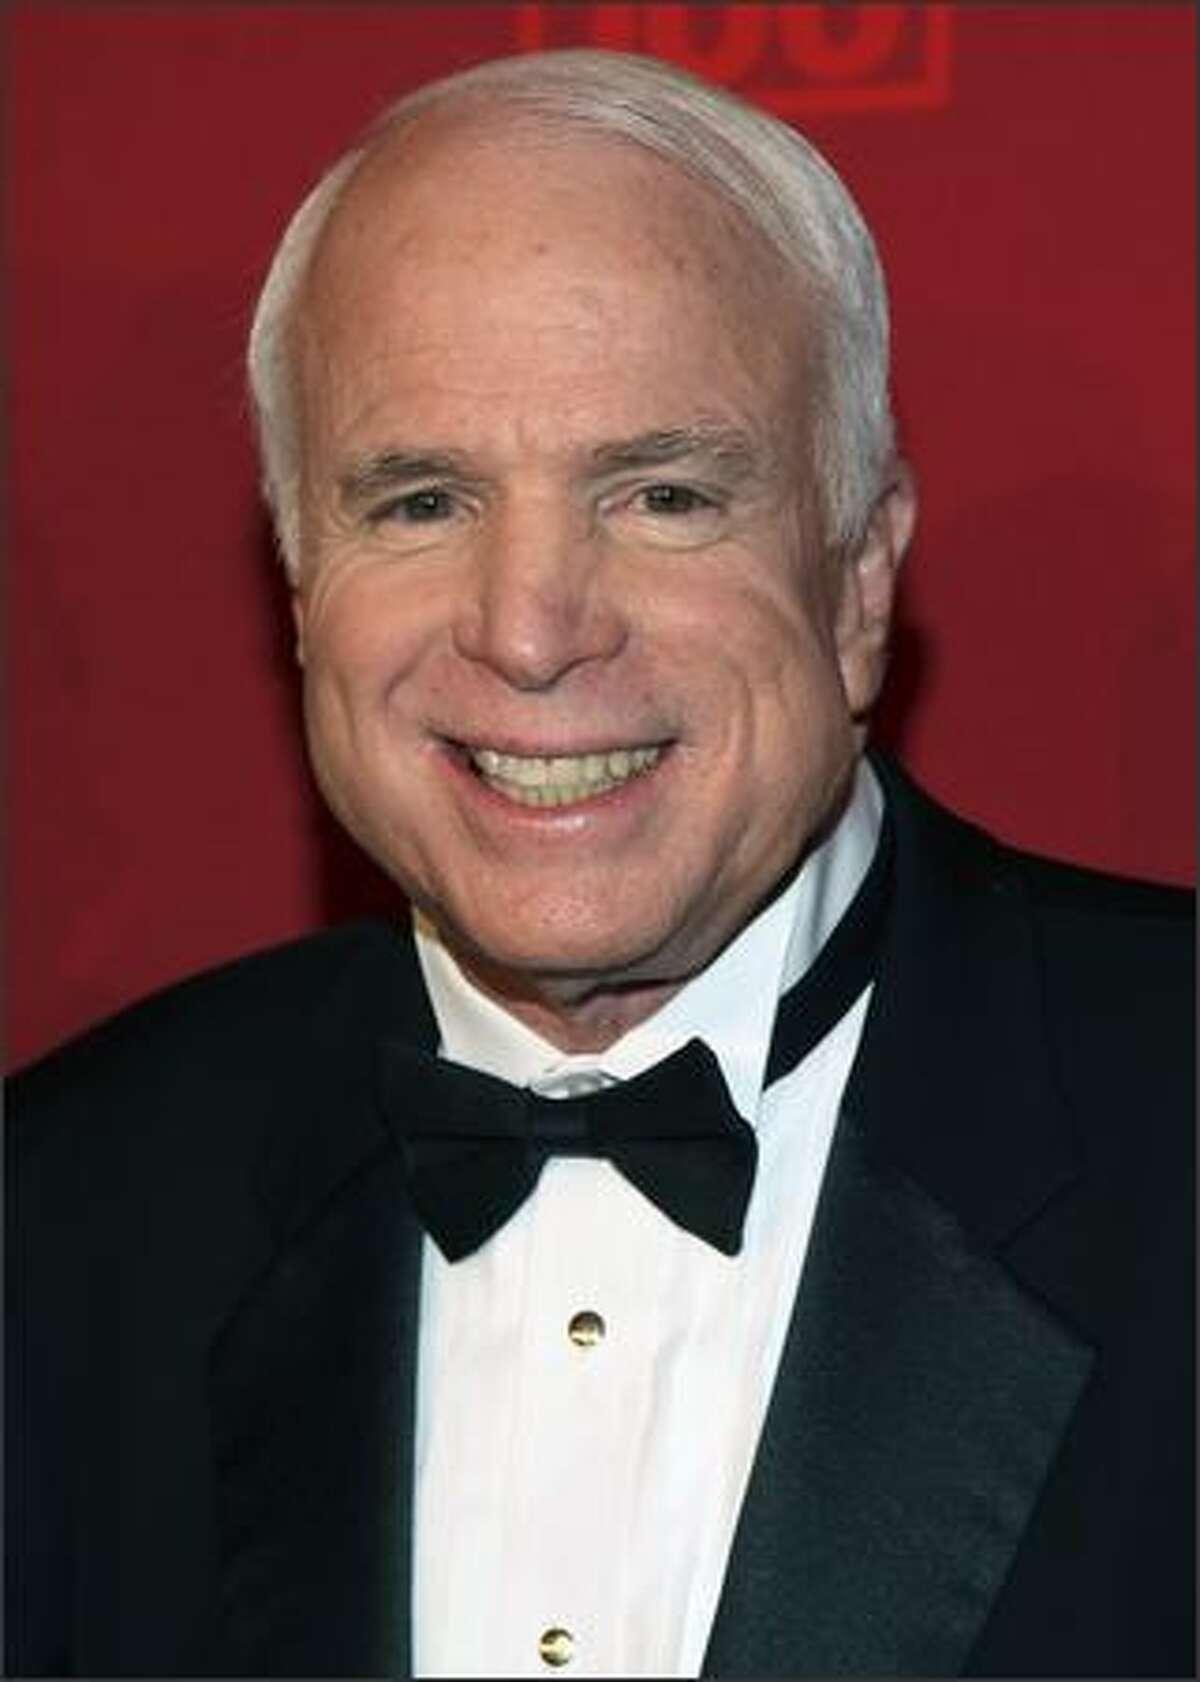 Sen. John McCain arrives.